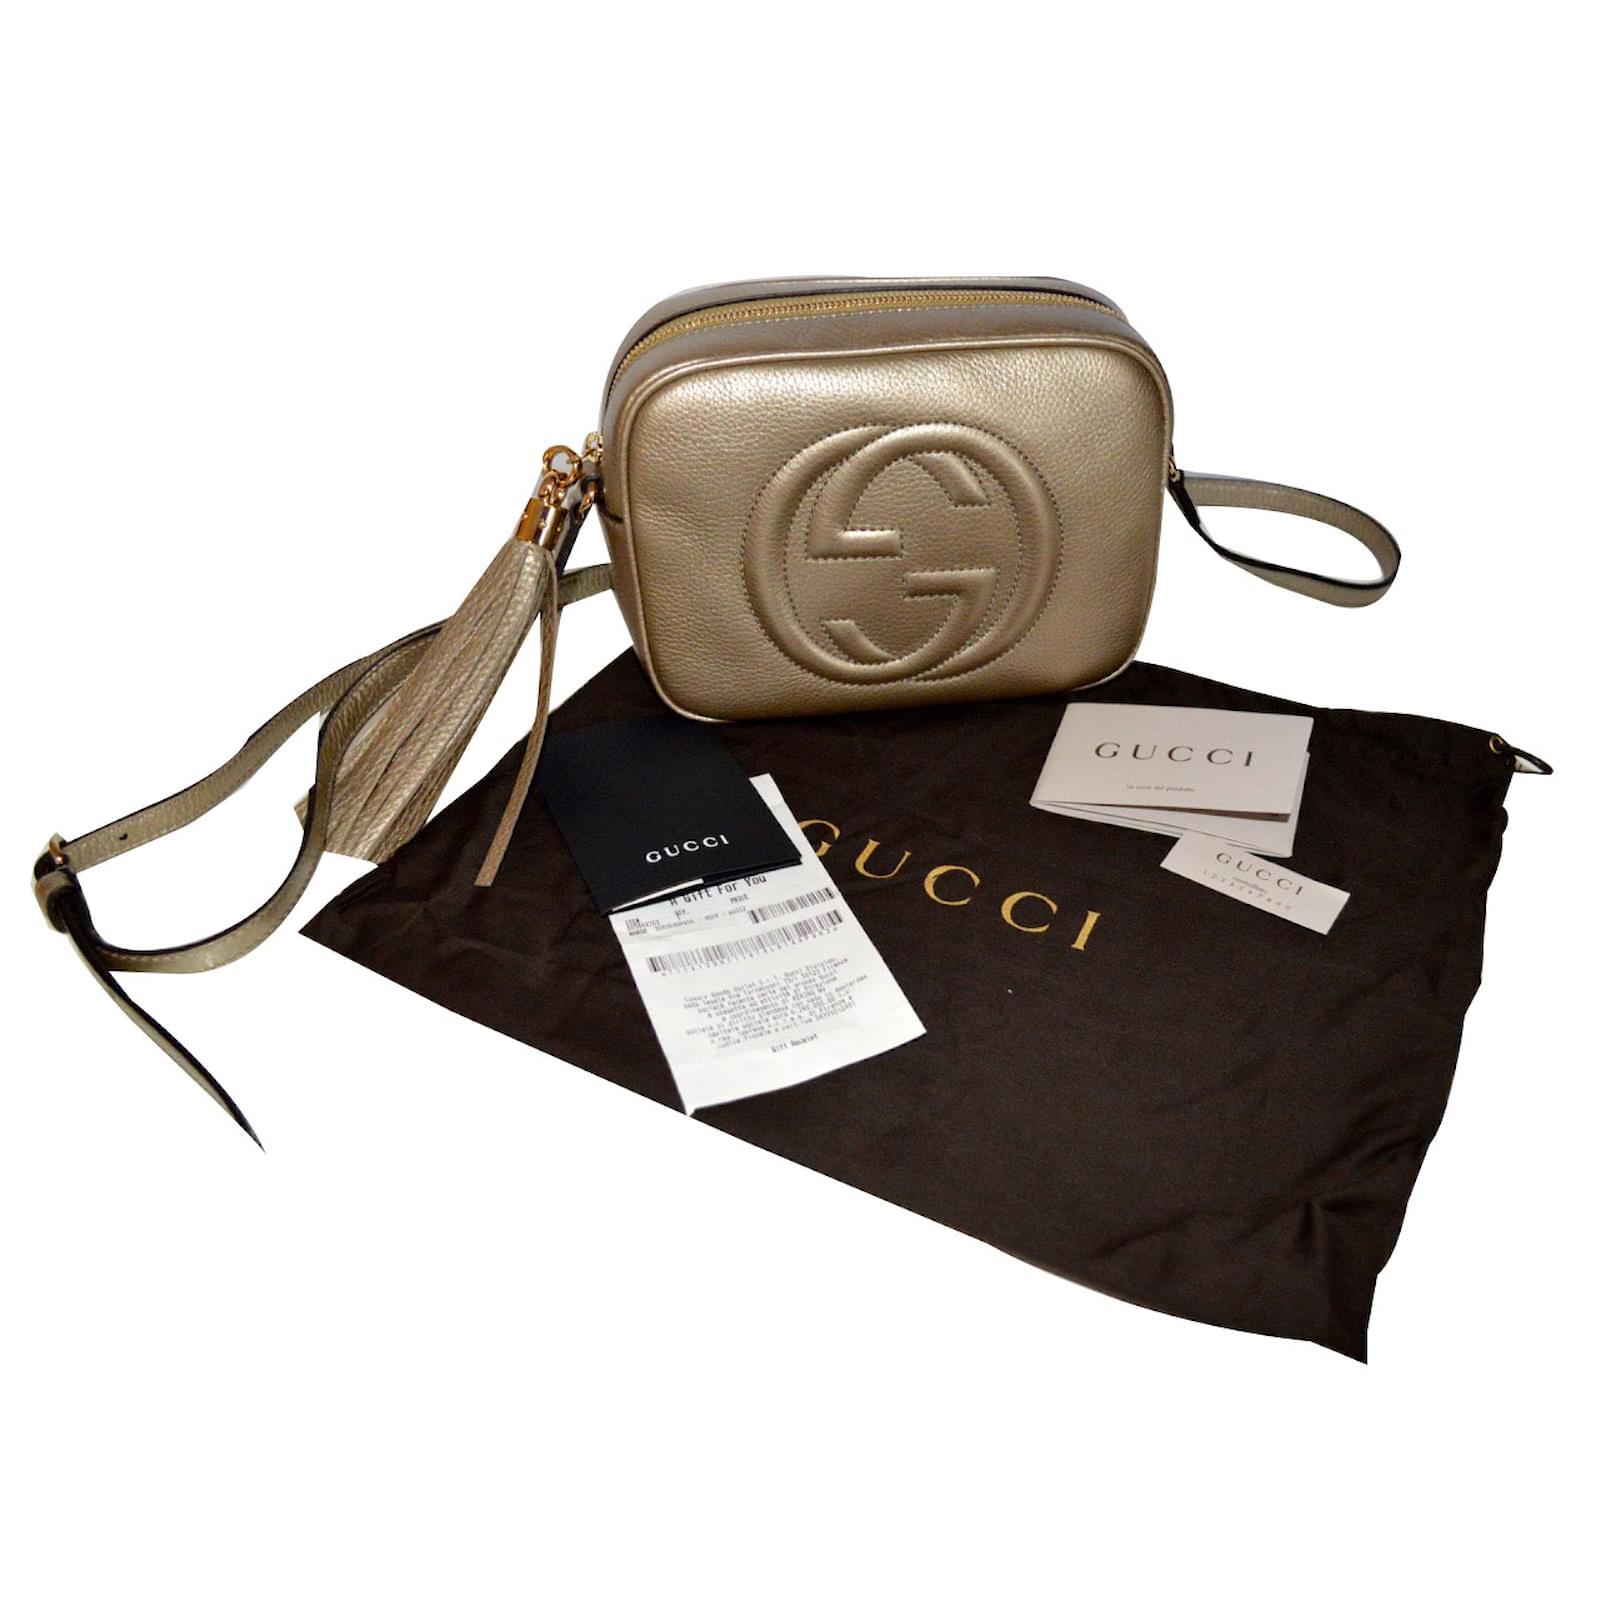 Gucci Gucci soho discobag new with giftreceipt gold Handbags Leather Golden  ref.42081 - Joli Closet 7c9845e0236ec